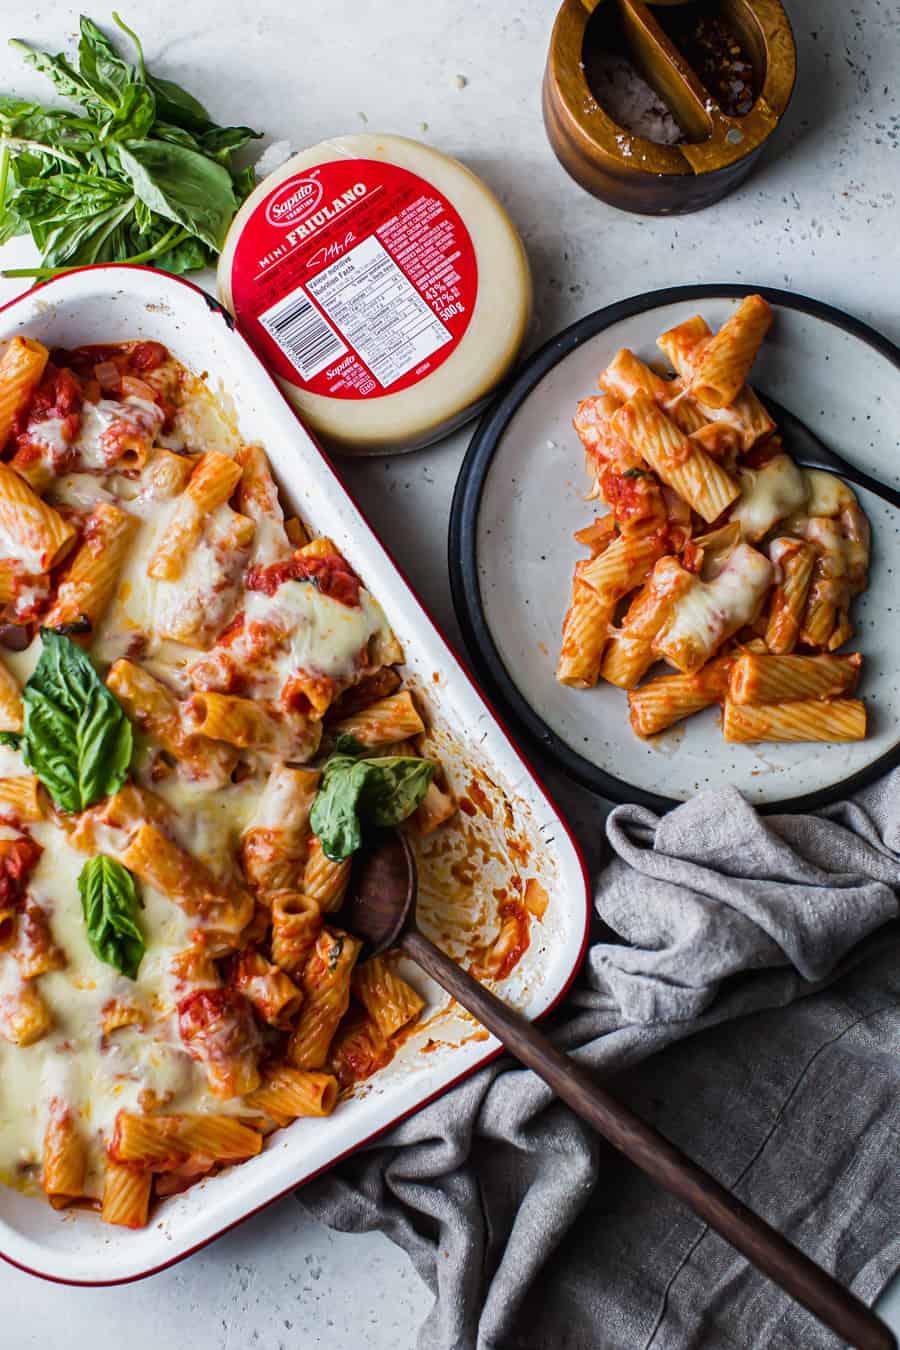 baked rigatoni with arrabbiata and Friulano